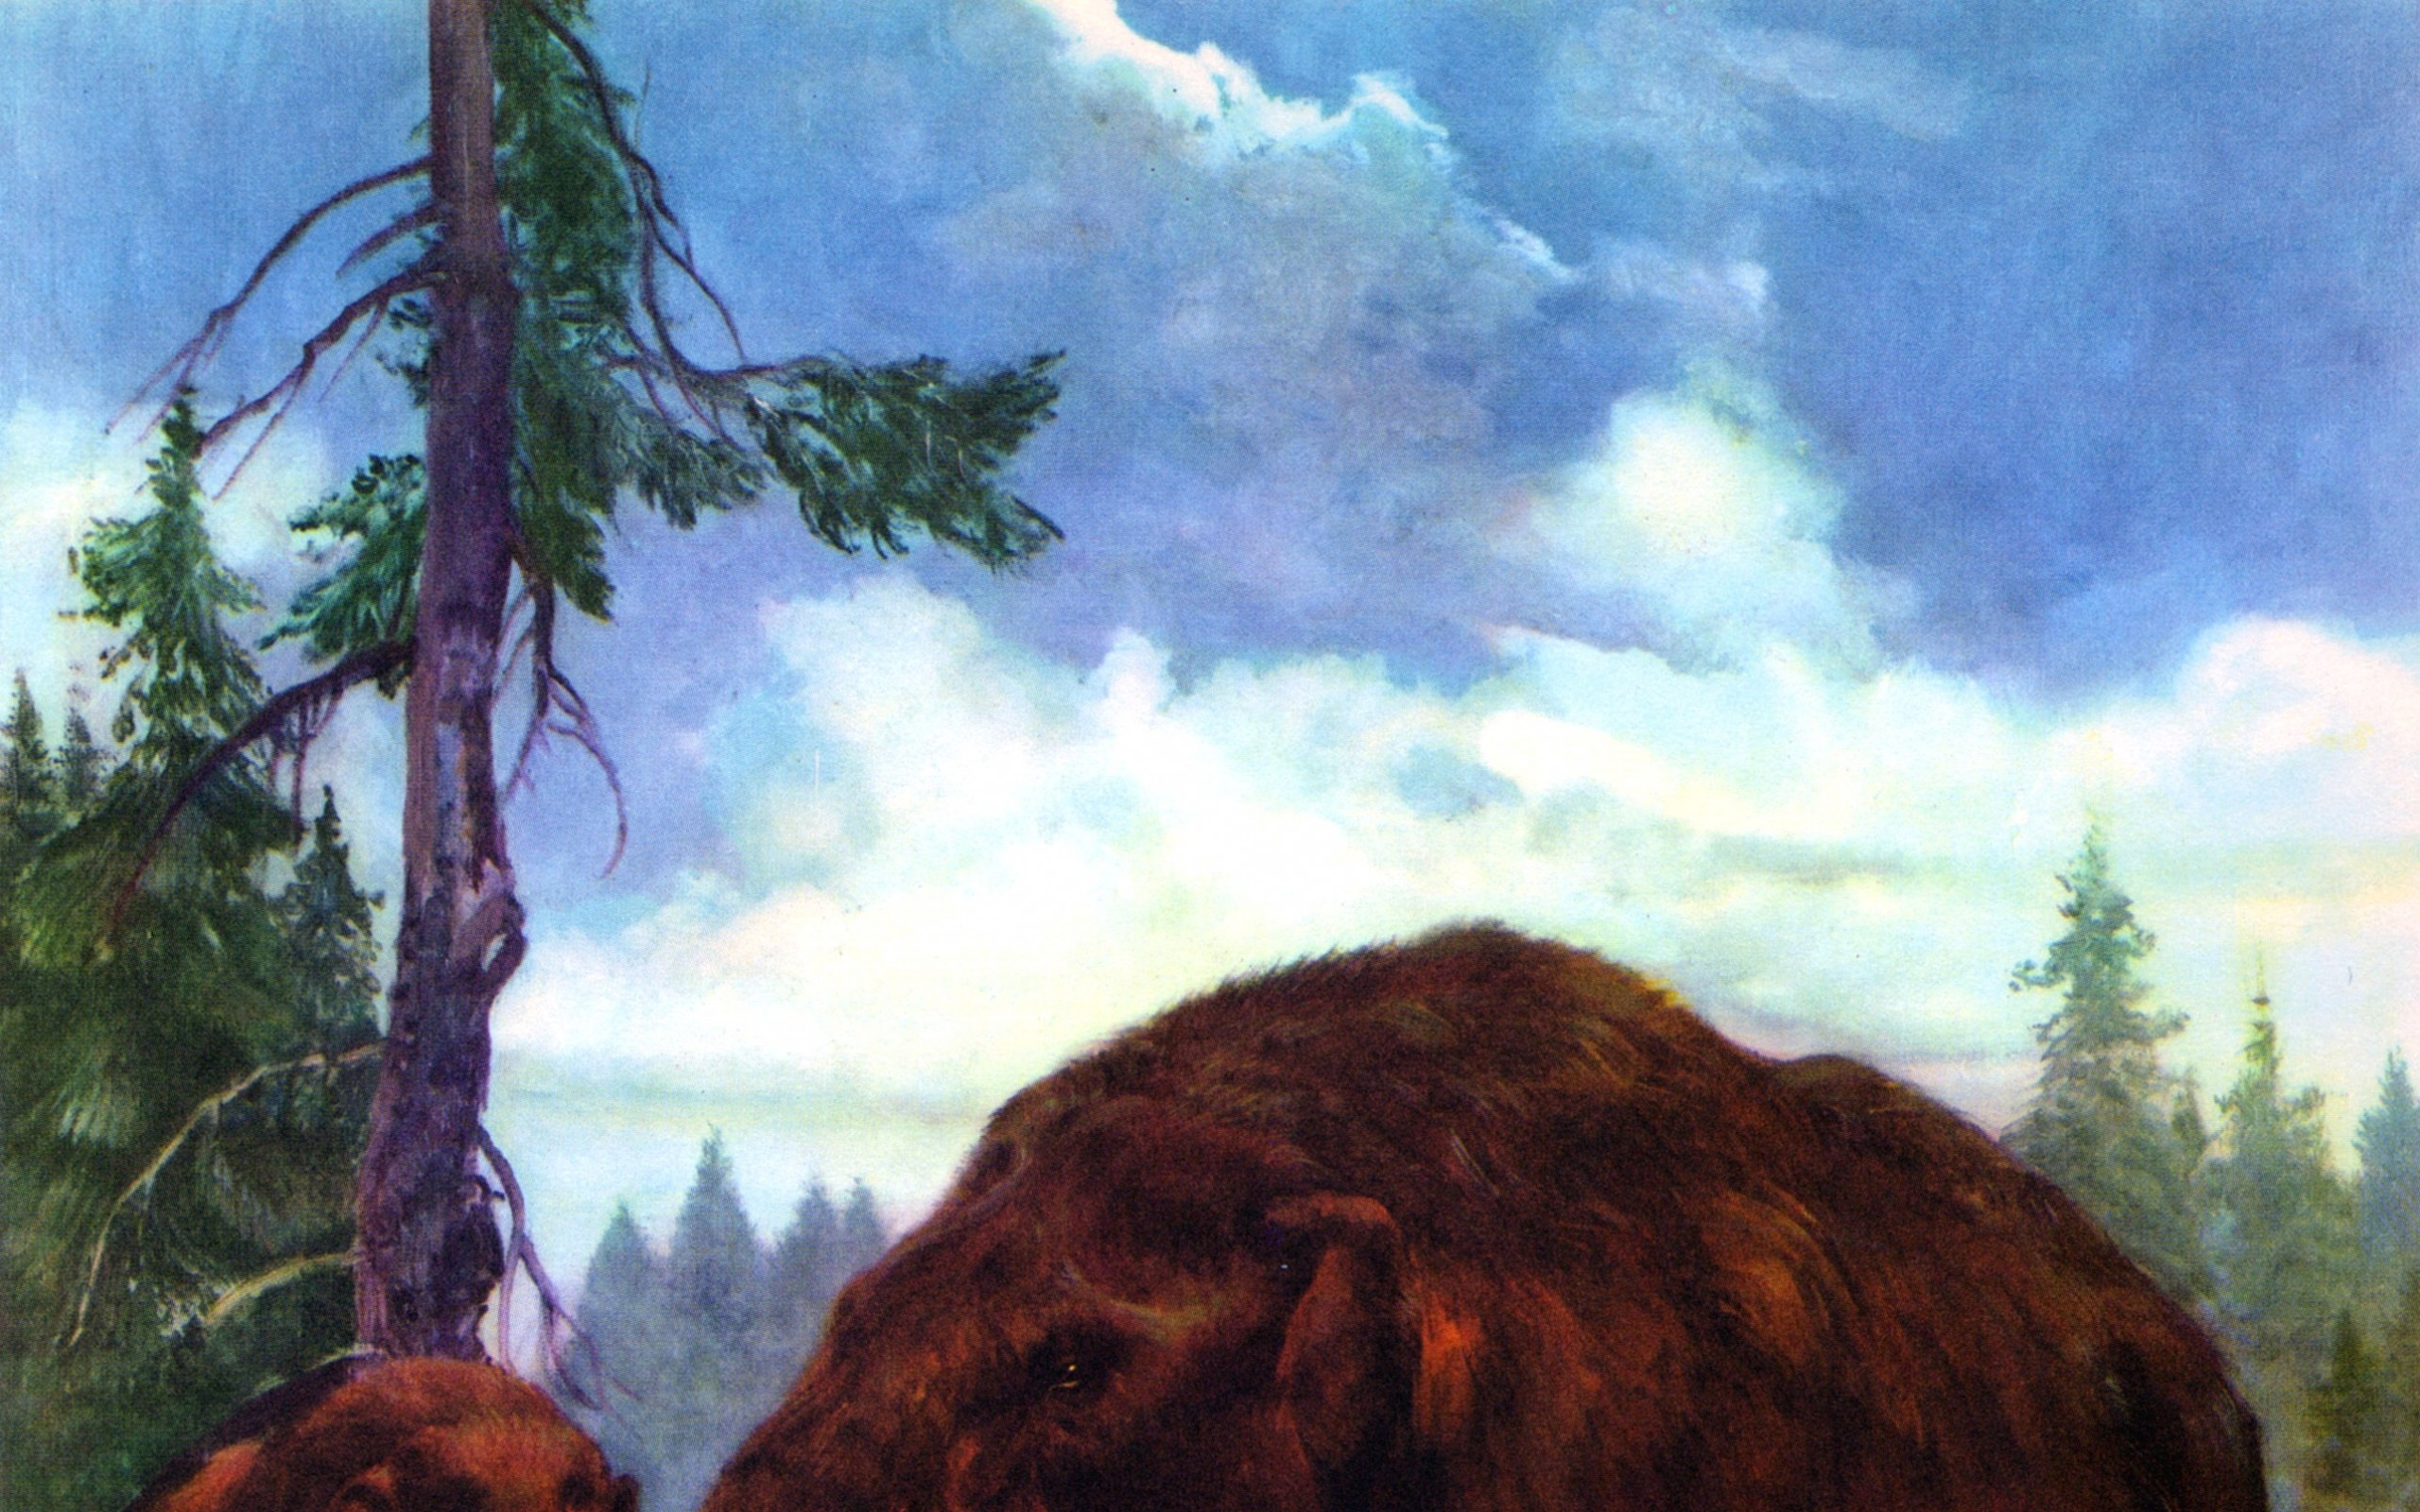 paintings prehistoric mastodon zdenek burian 2574×3090 wallpaper Art HD  Wallpaper